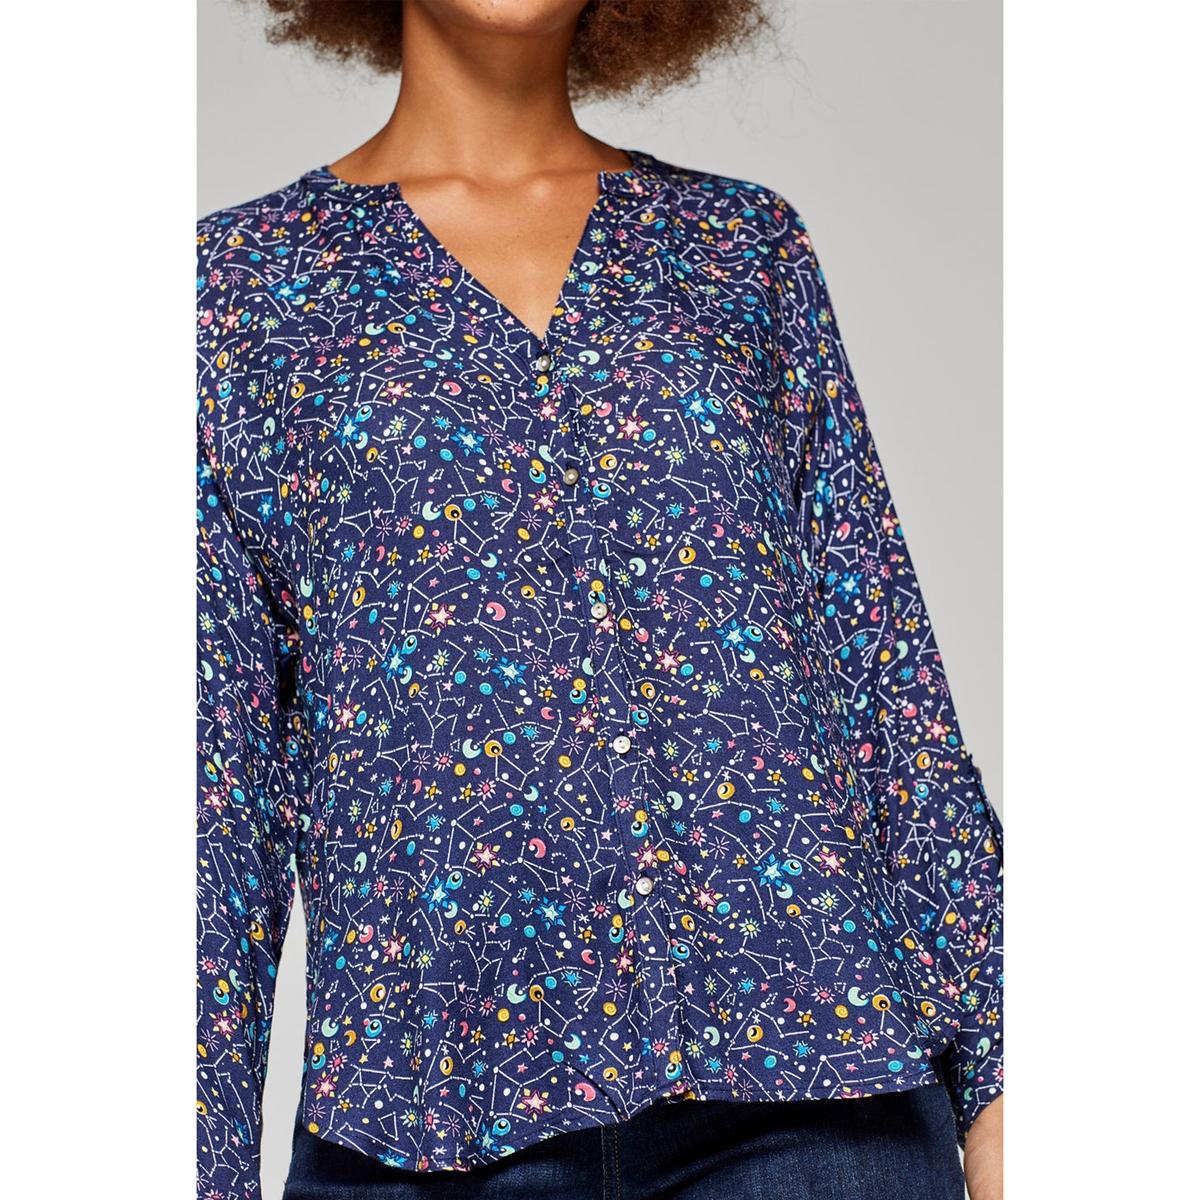 Blusa con cuello de pico gráfica, de manga larga